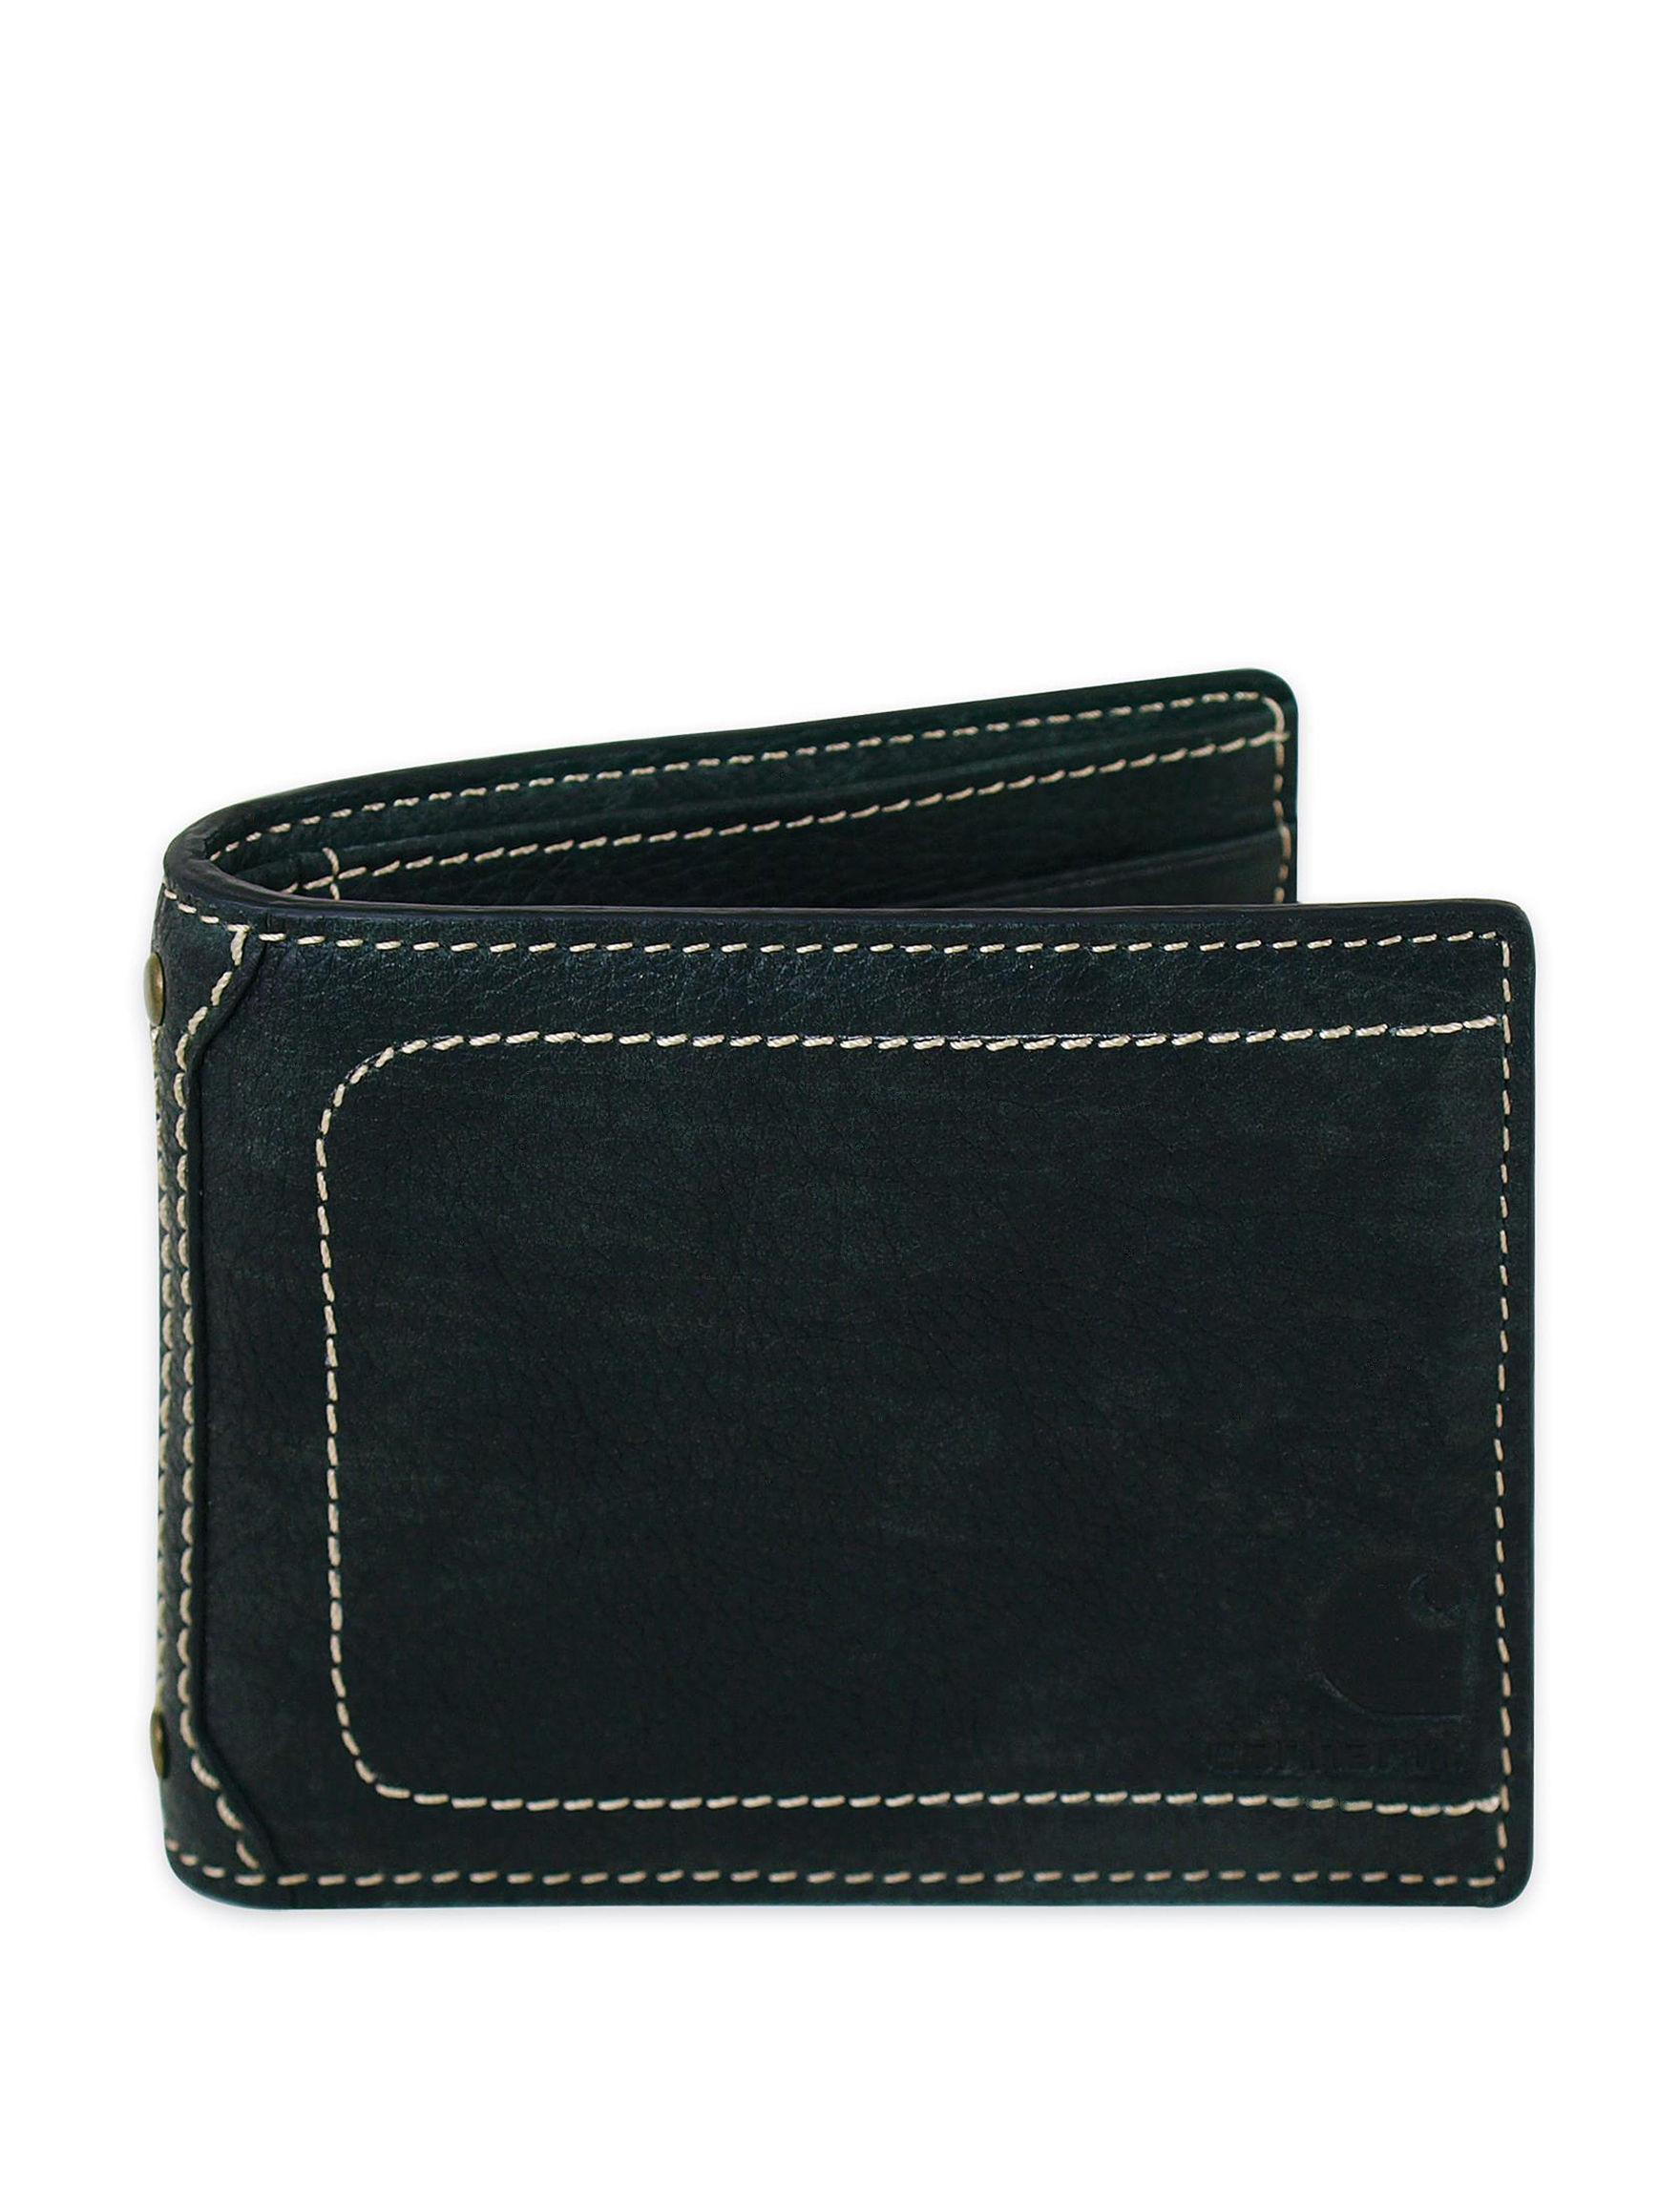 Carhartt Black Bi-fold Wallets